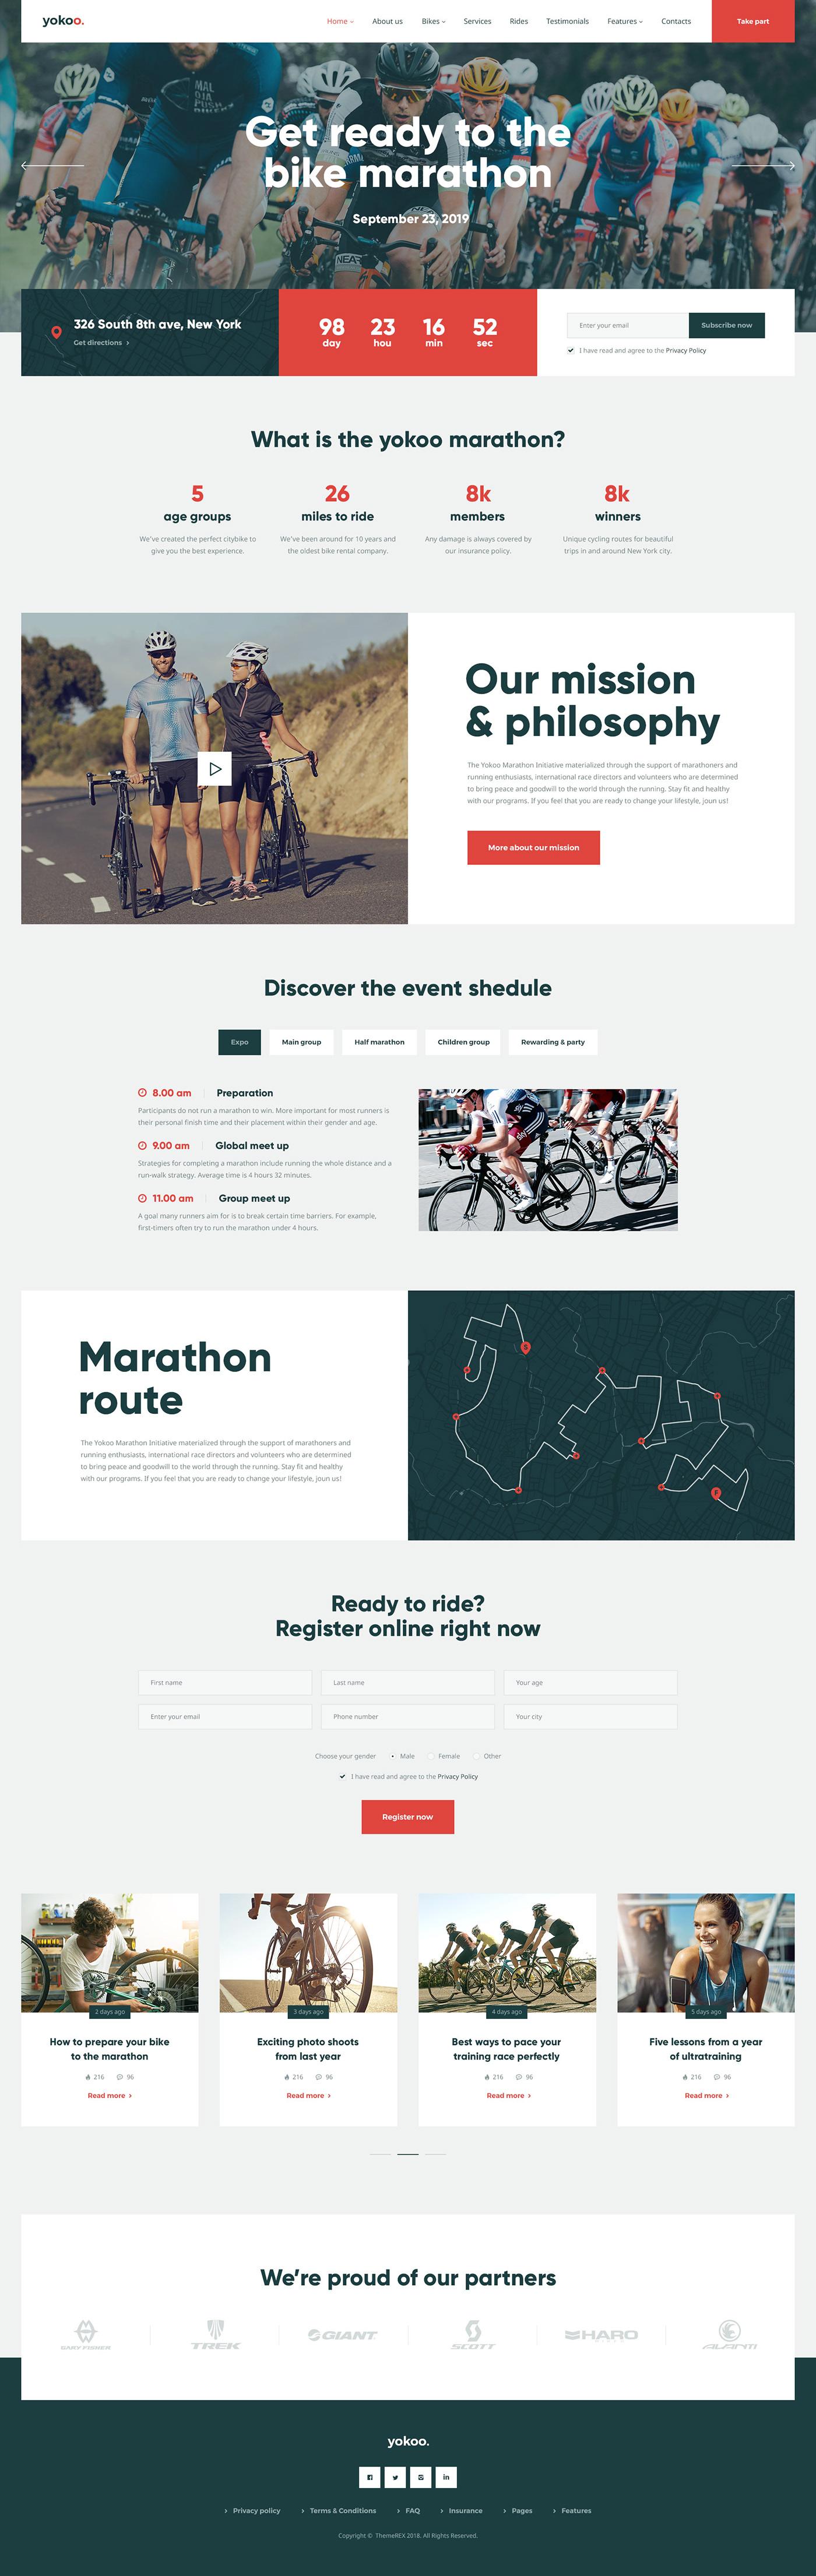 Image may contain: screenshot and bicycle